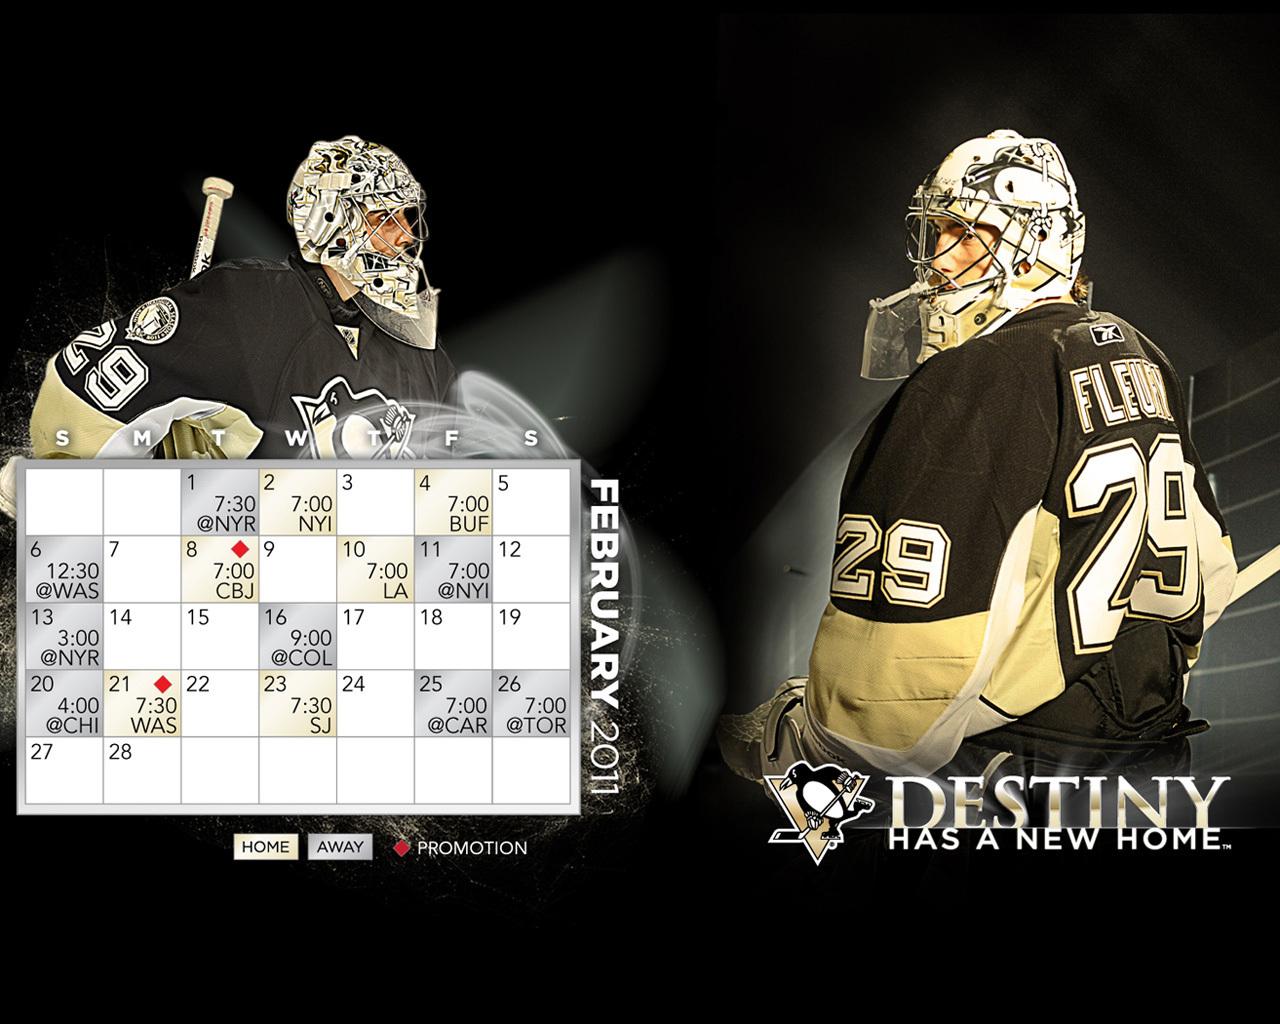 February 2011 CalendarSchedule   Marc Andre Fleury Wallpaper 1280x1024